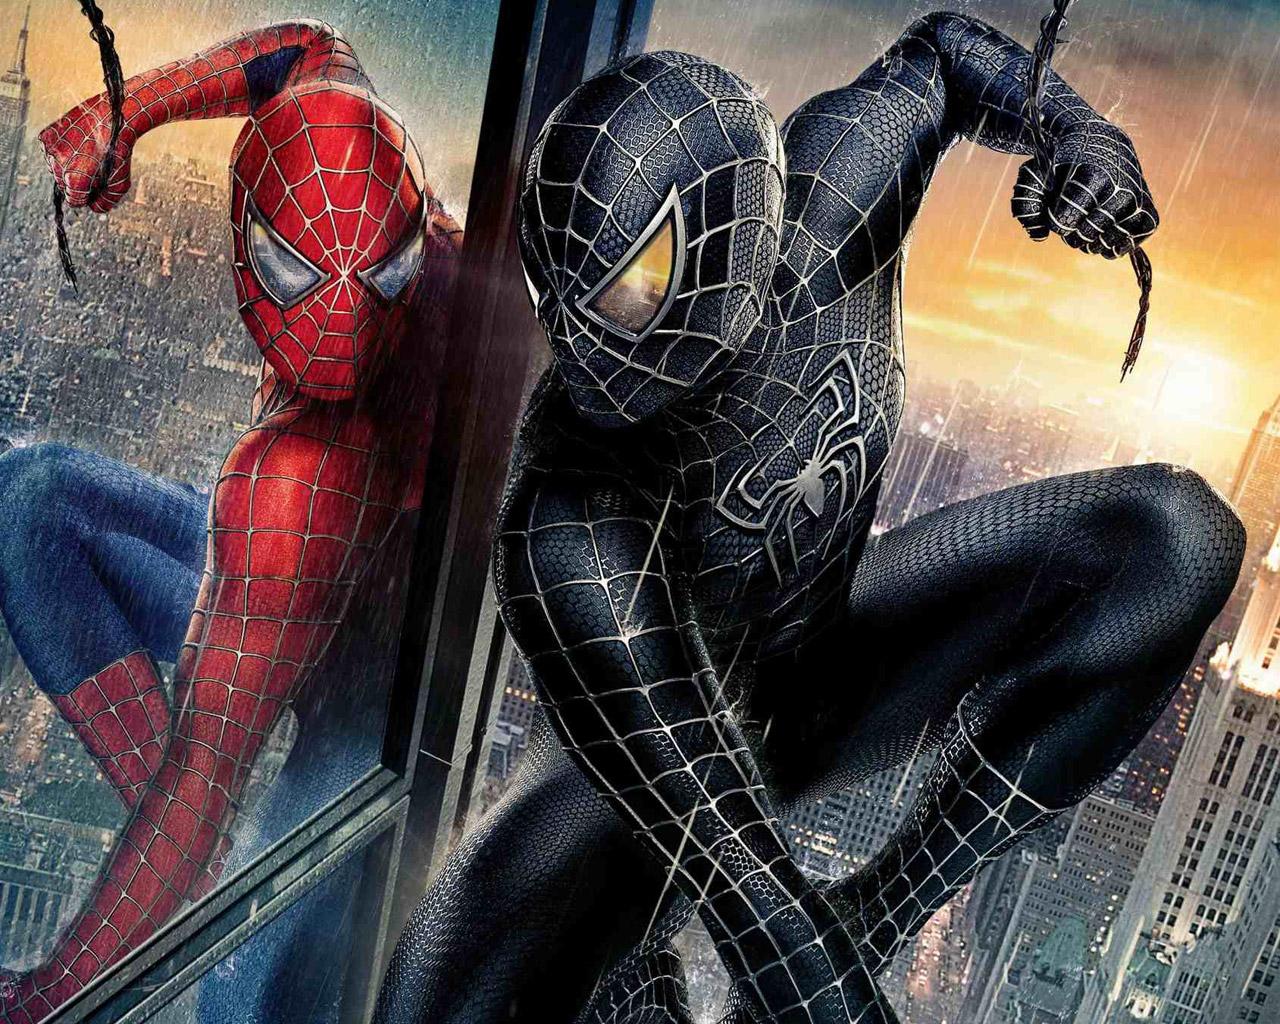 black spiderman wallpaper,spider man,action adventure game,superhero,fictional character,cg artwork